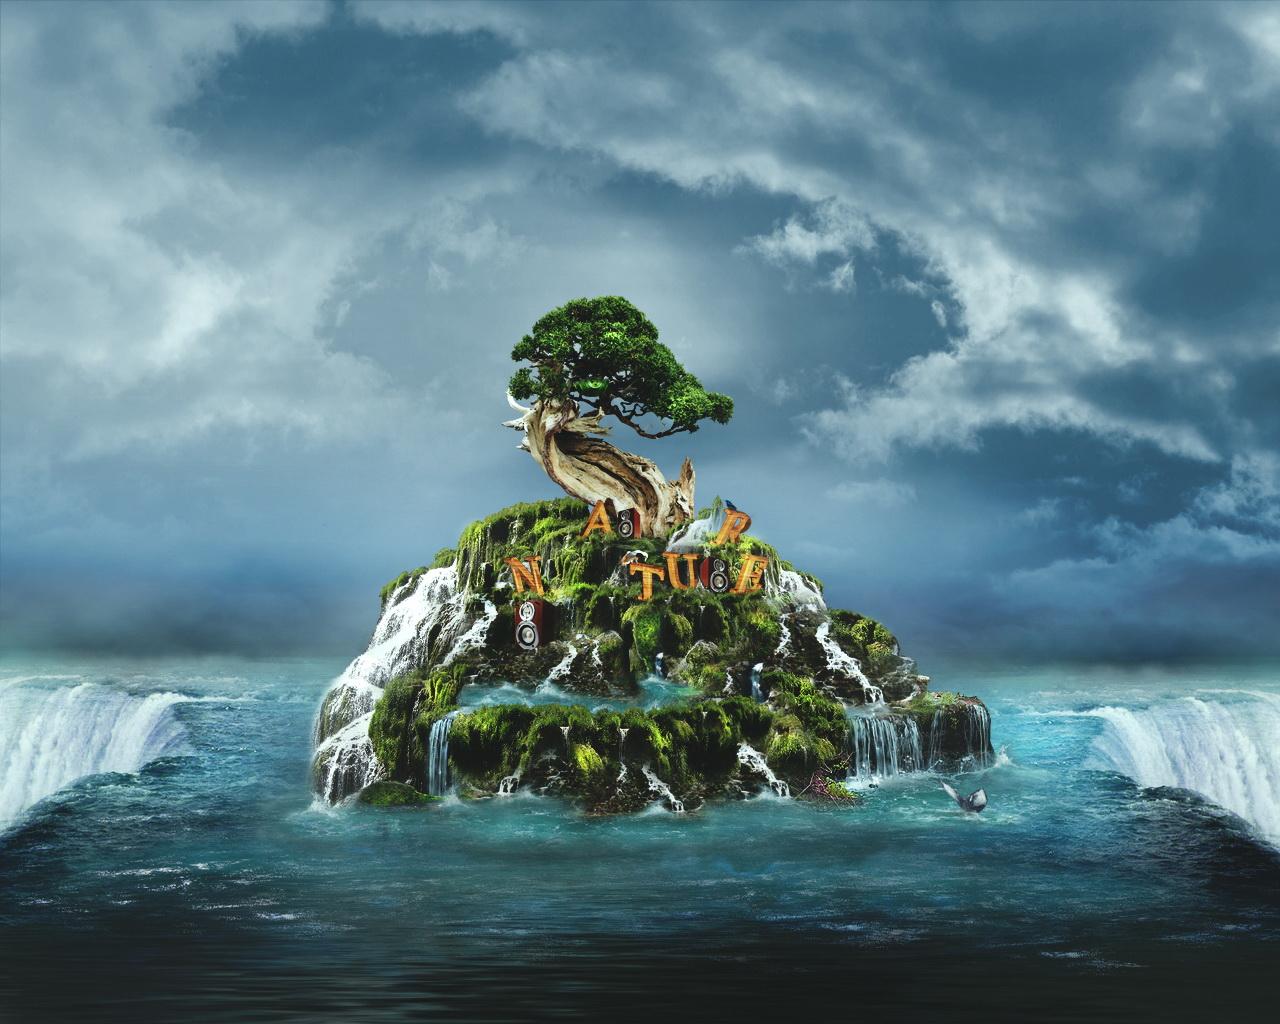 1280x1024 Nature island desktop PC and Mac wallpaper